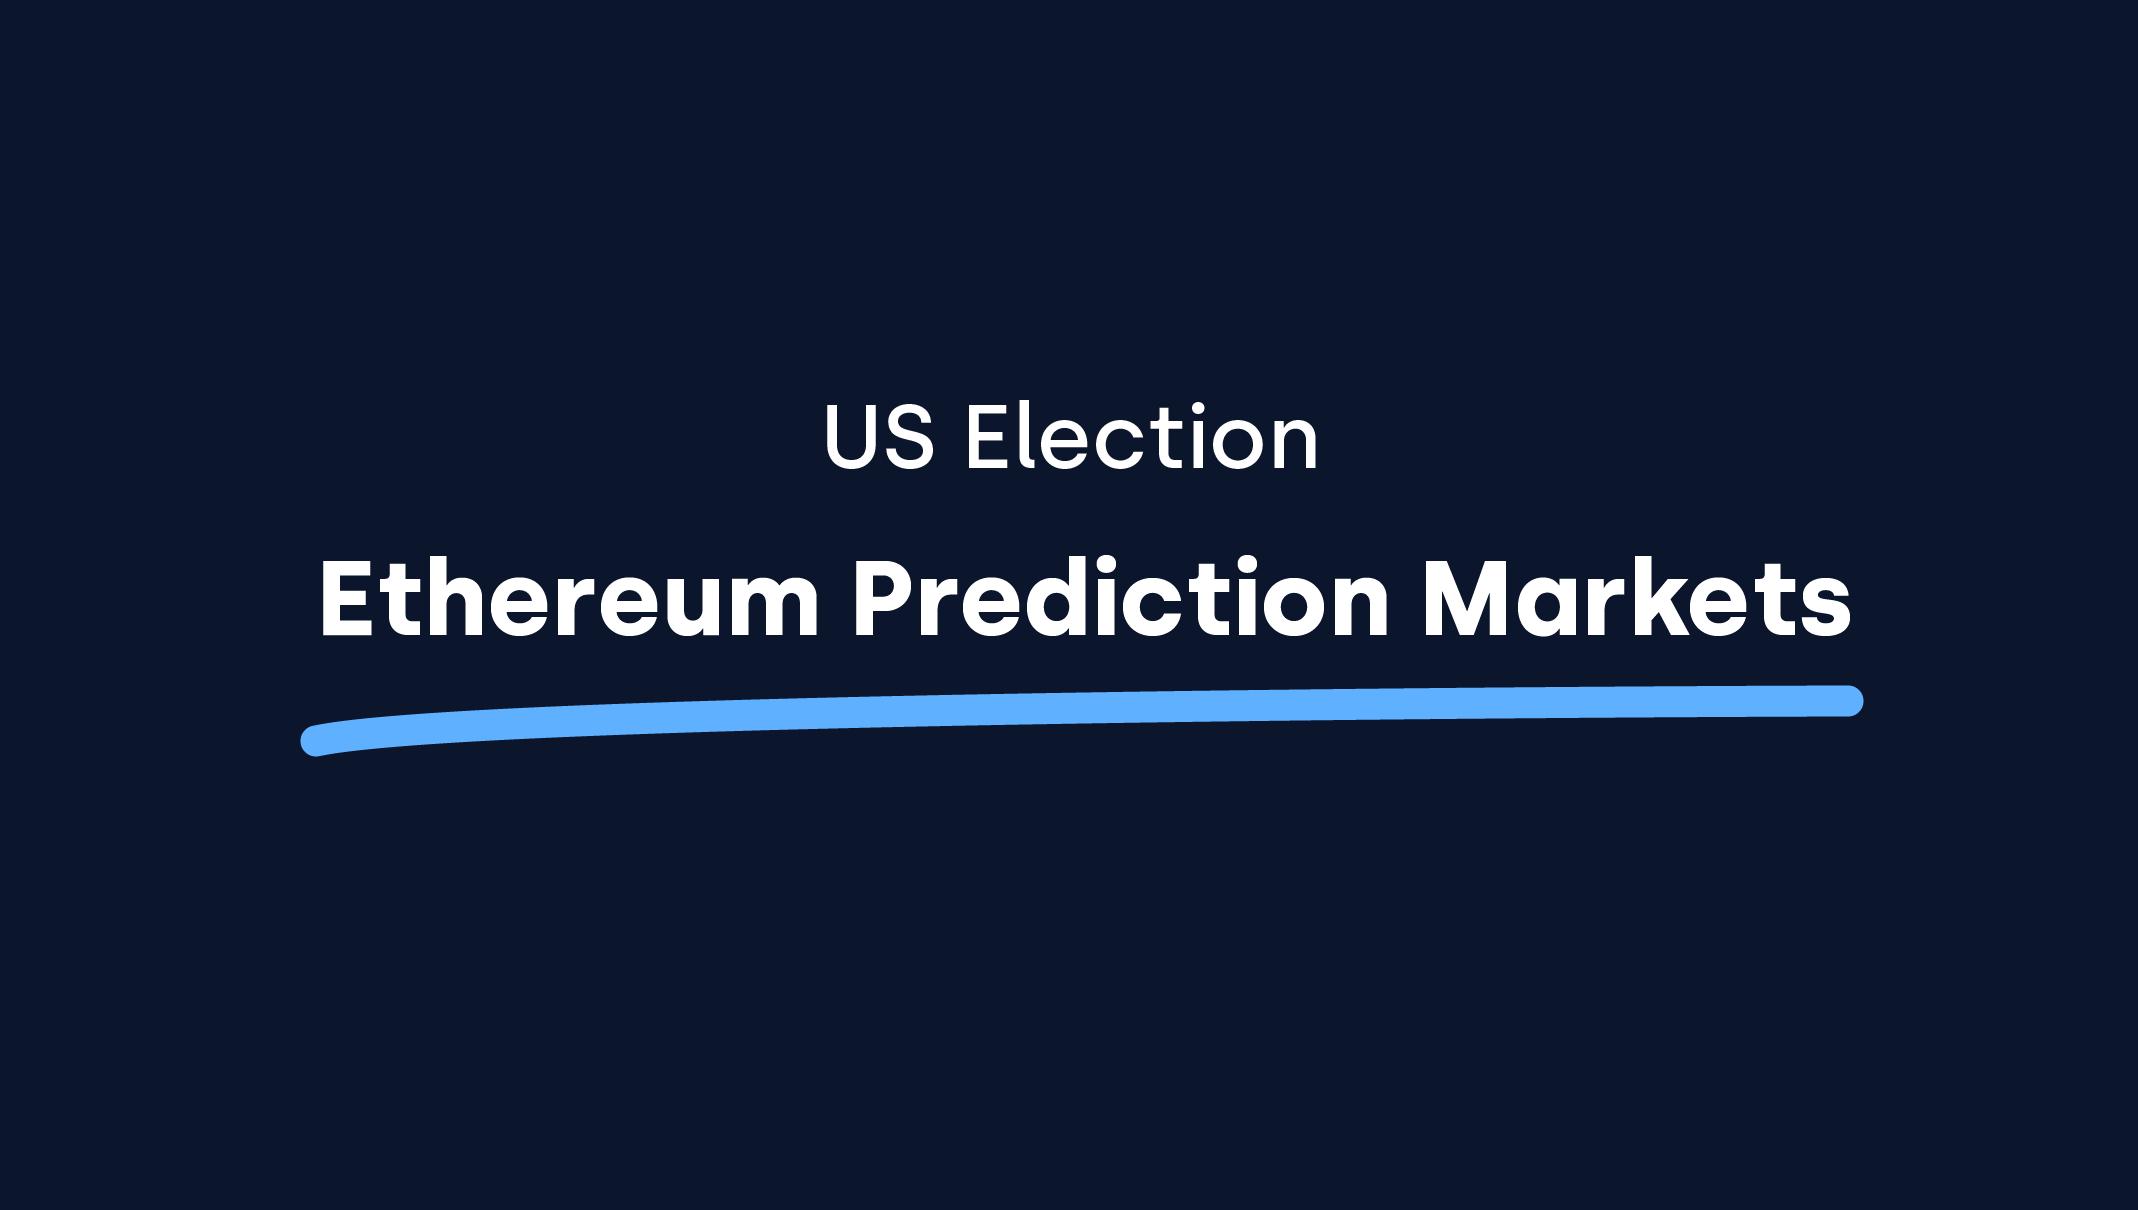 DeFi Presidential Prediction Markets OKCoin